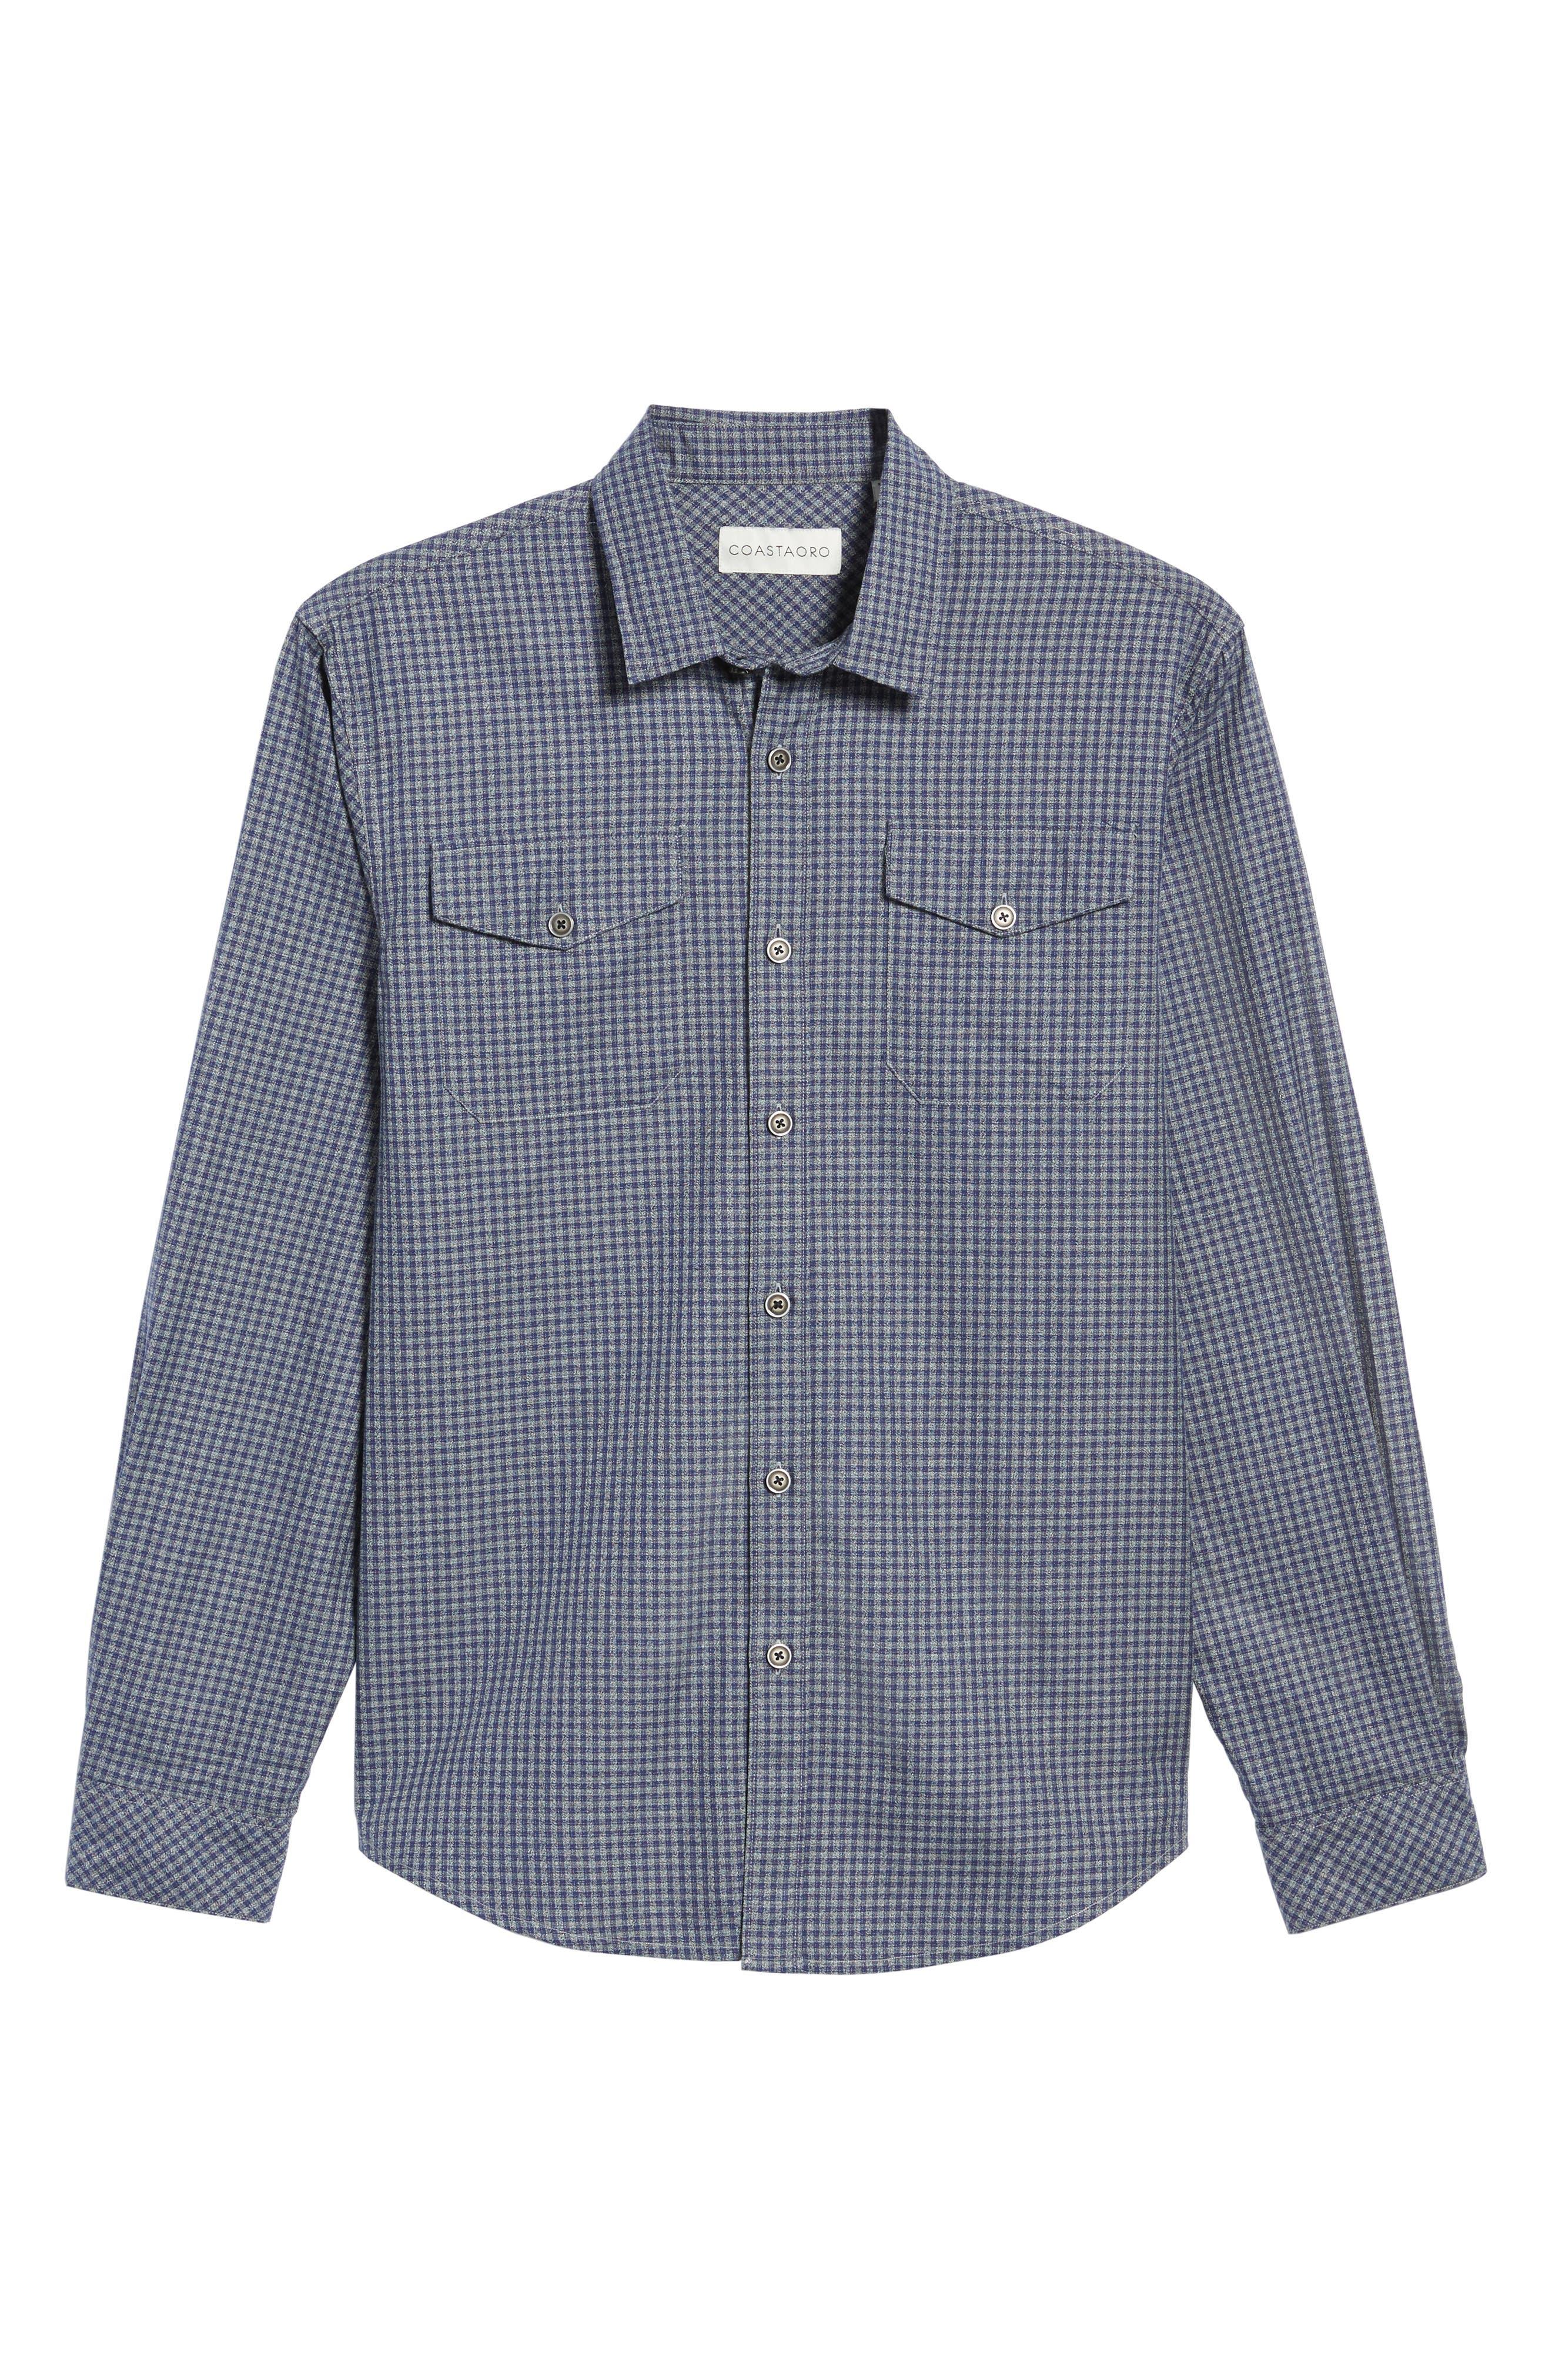 Alternate Image 6  - Coastaoro Main Street Check Flannel Shirt